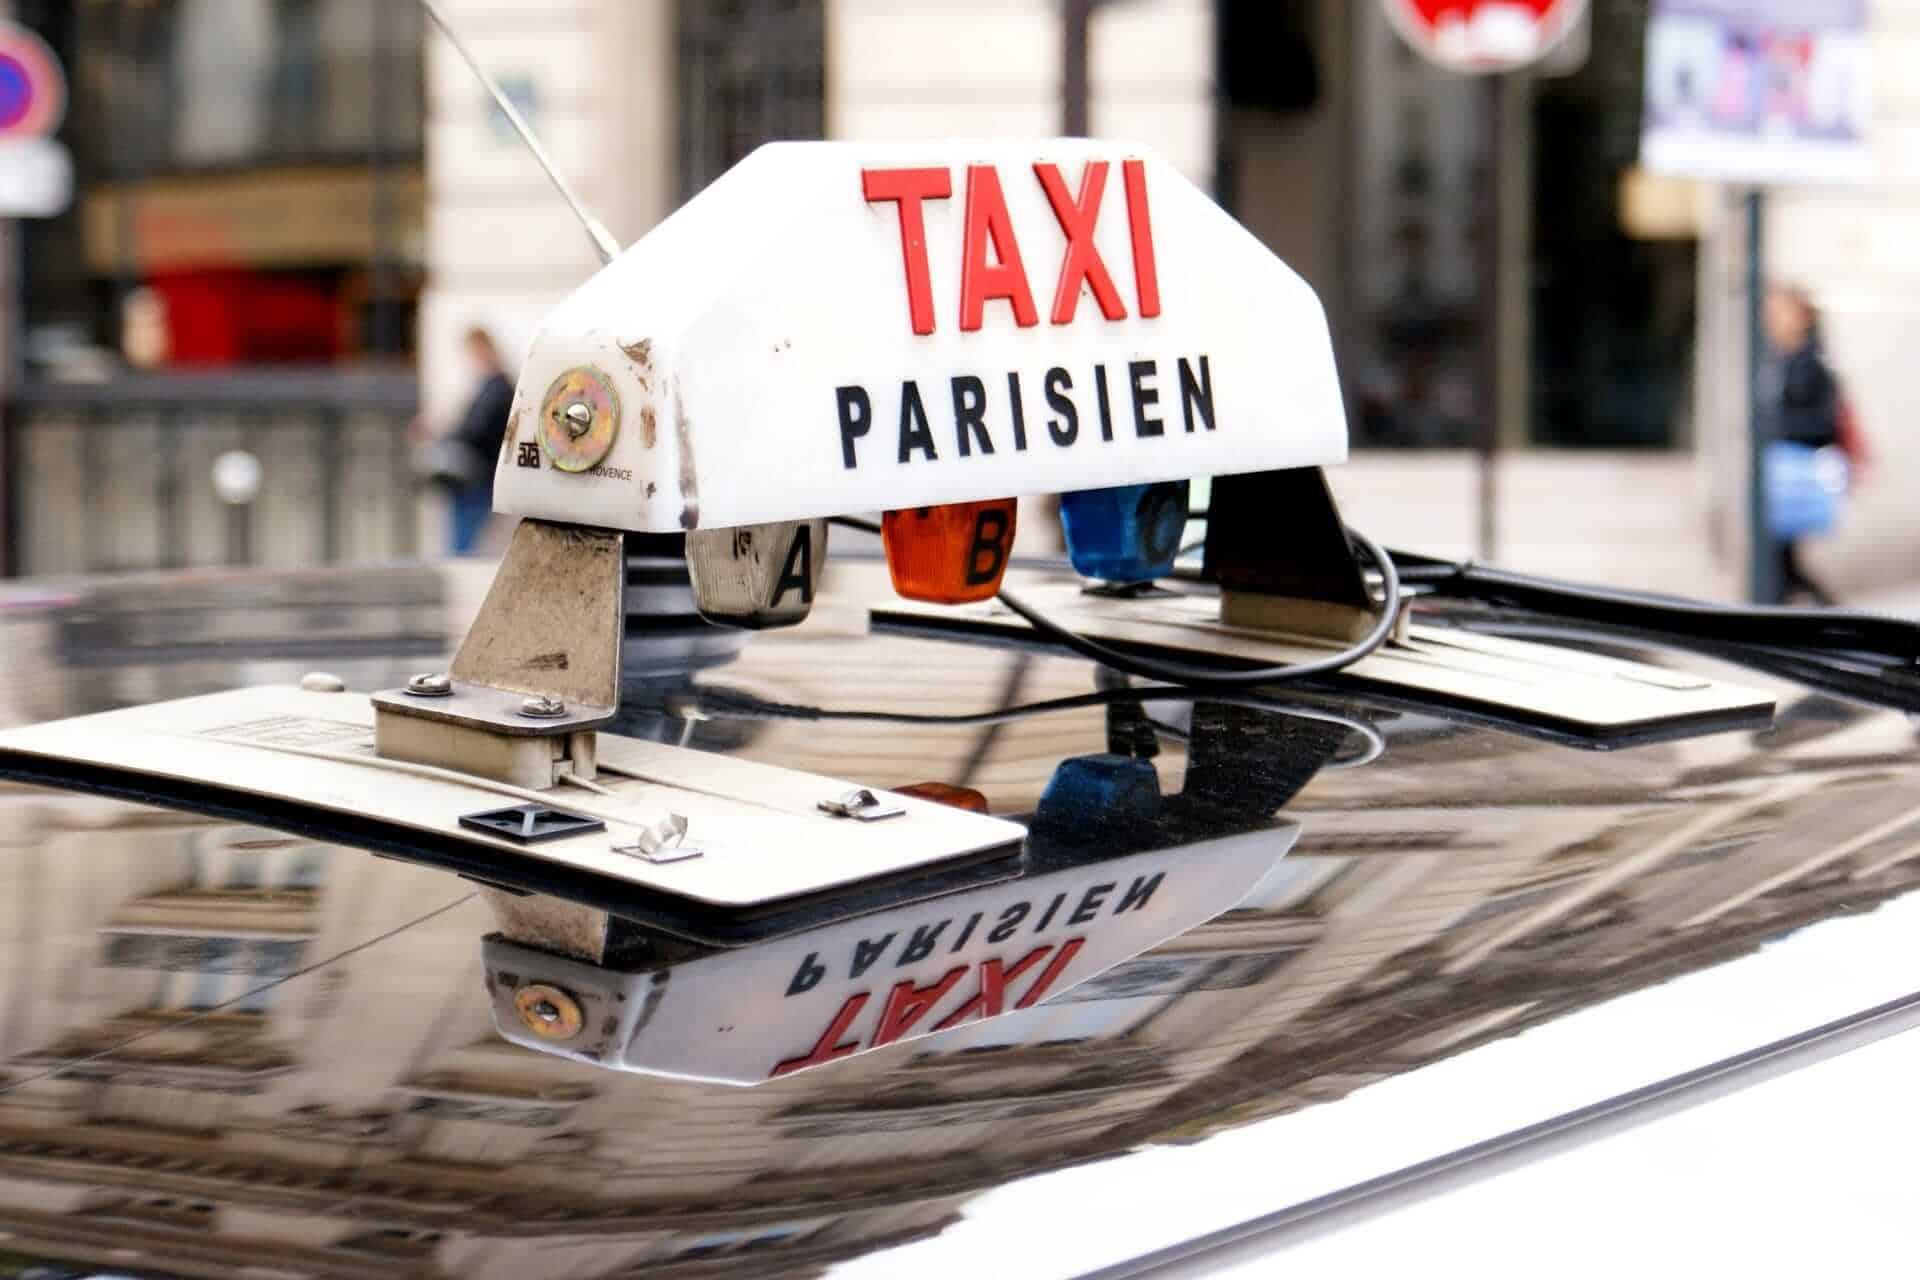 Taxis, Paris